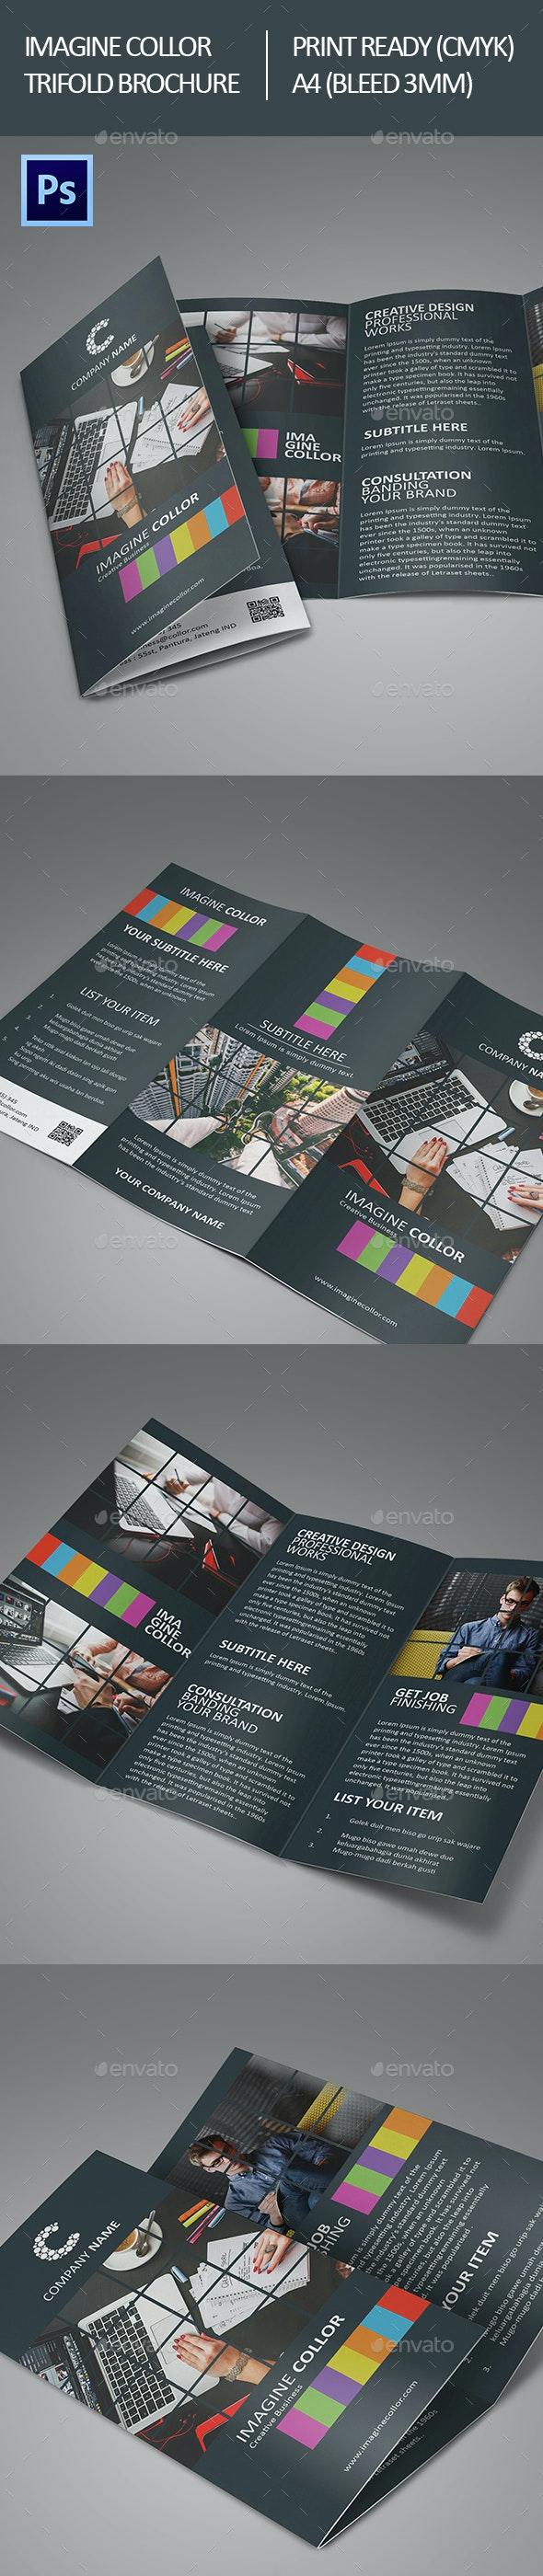 Imagine Collor Trifold Brochure - Corporate Brochures